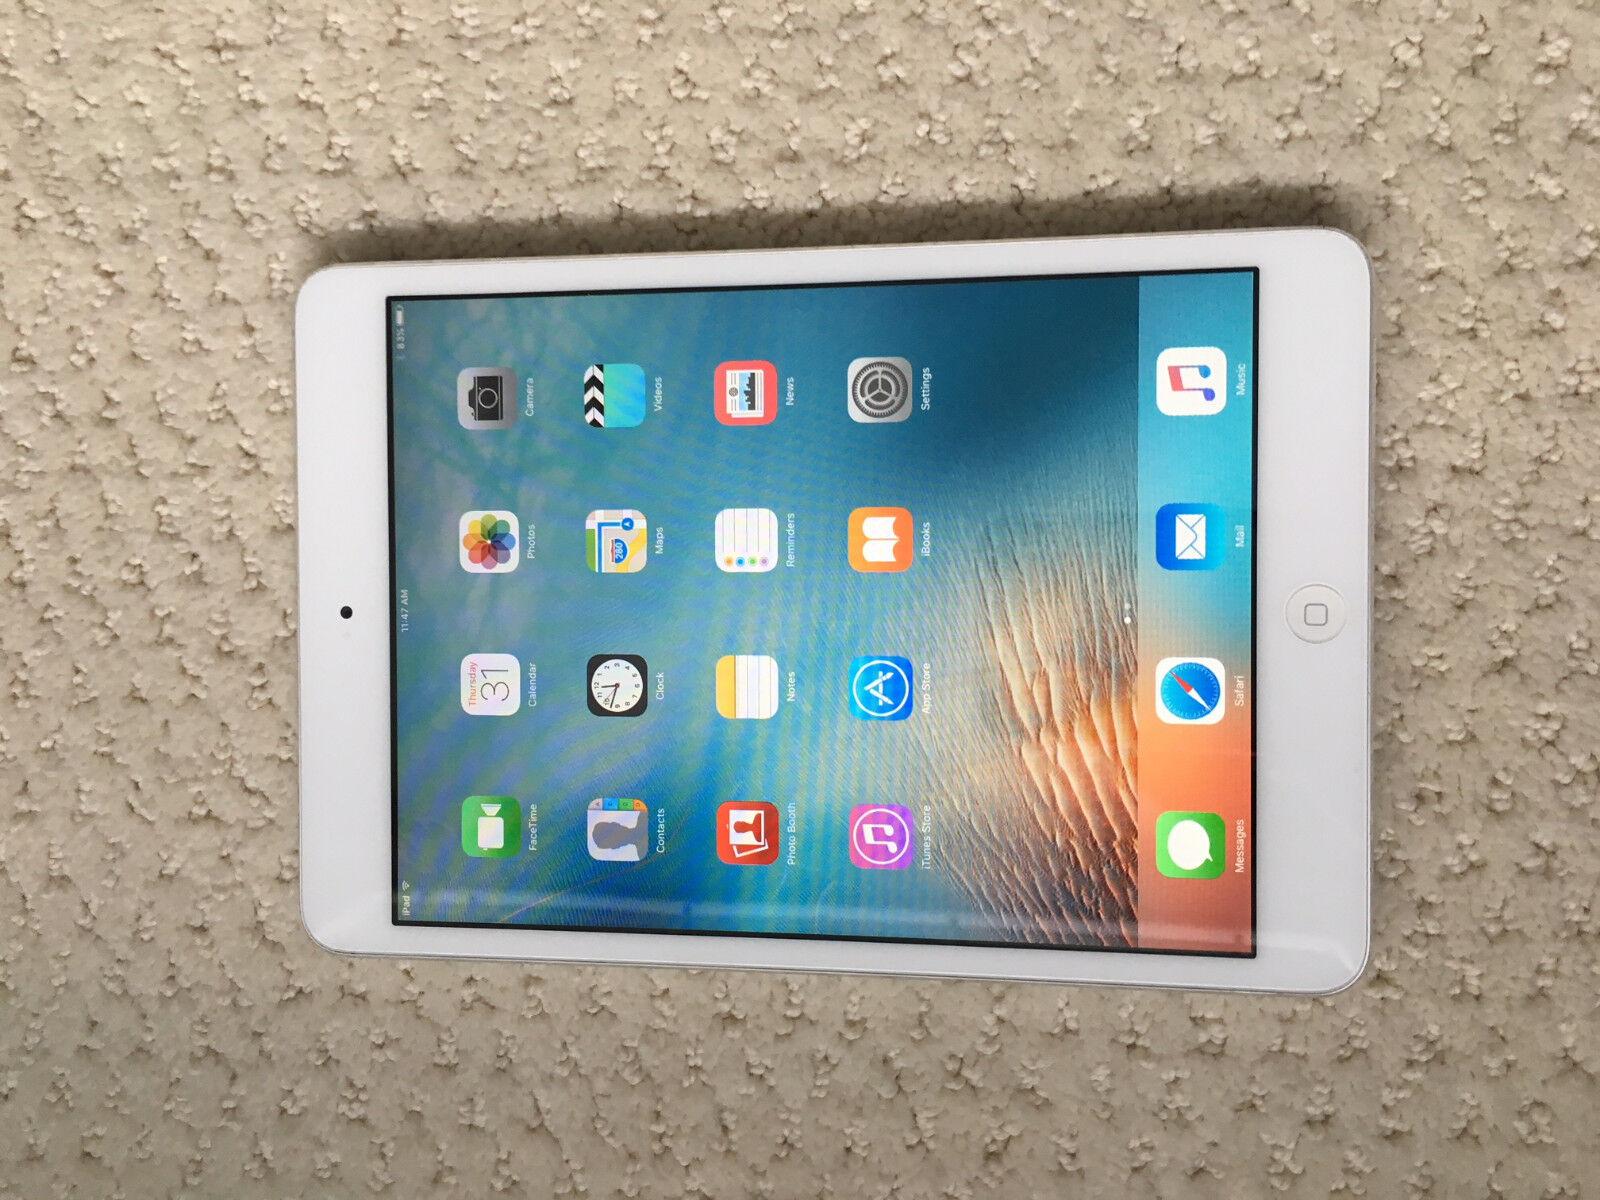 Apple iPad 2/3/4/5, Mini 1/2/3/4,  air 1/2, Silver/Gray/Black/Gold, WIFI